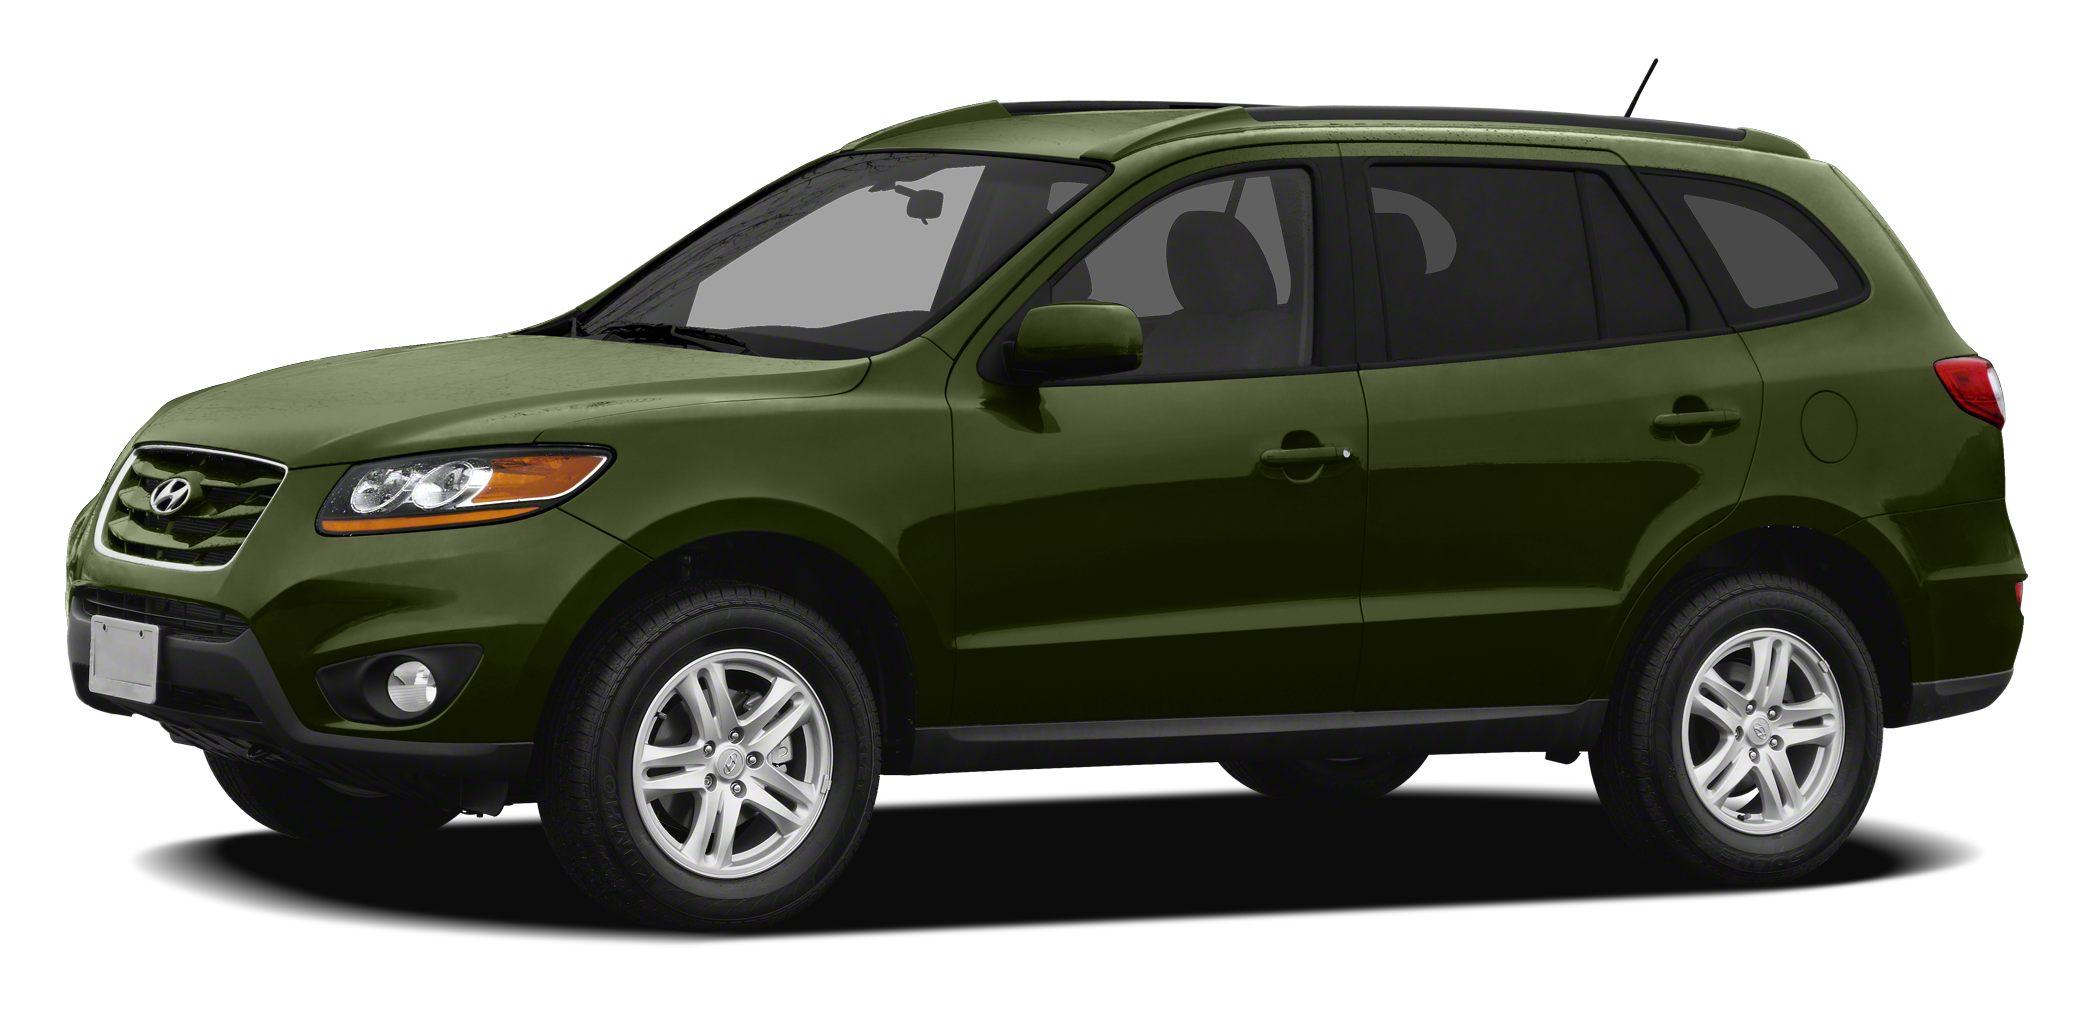 2012 Hyundai Santa Fe GLS Miles 31967Color Black Forest Green Stock L15393A VIN 5XYZG3AB0CG14